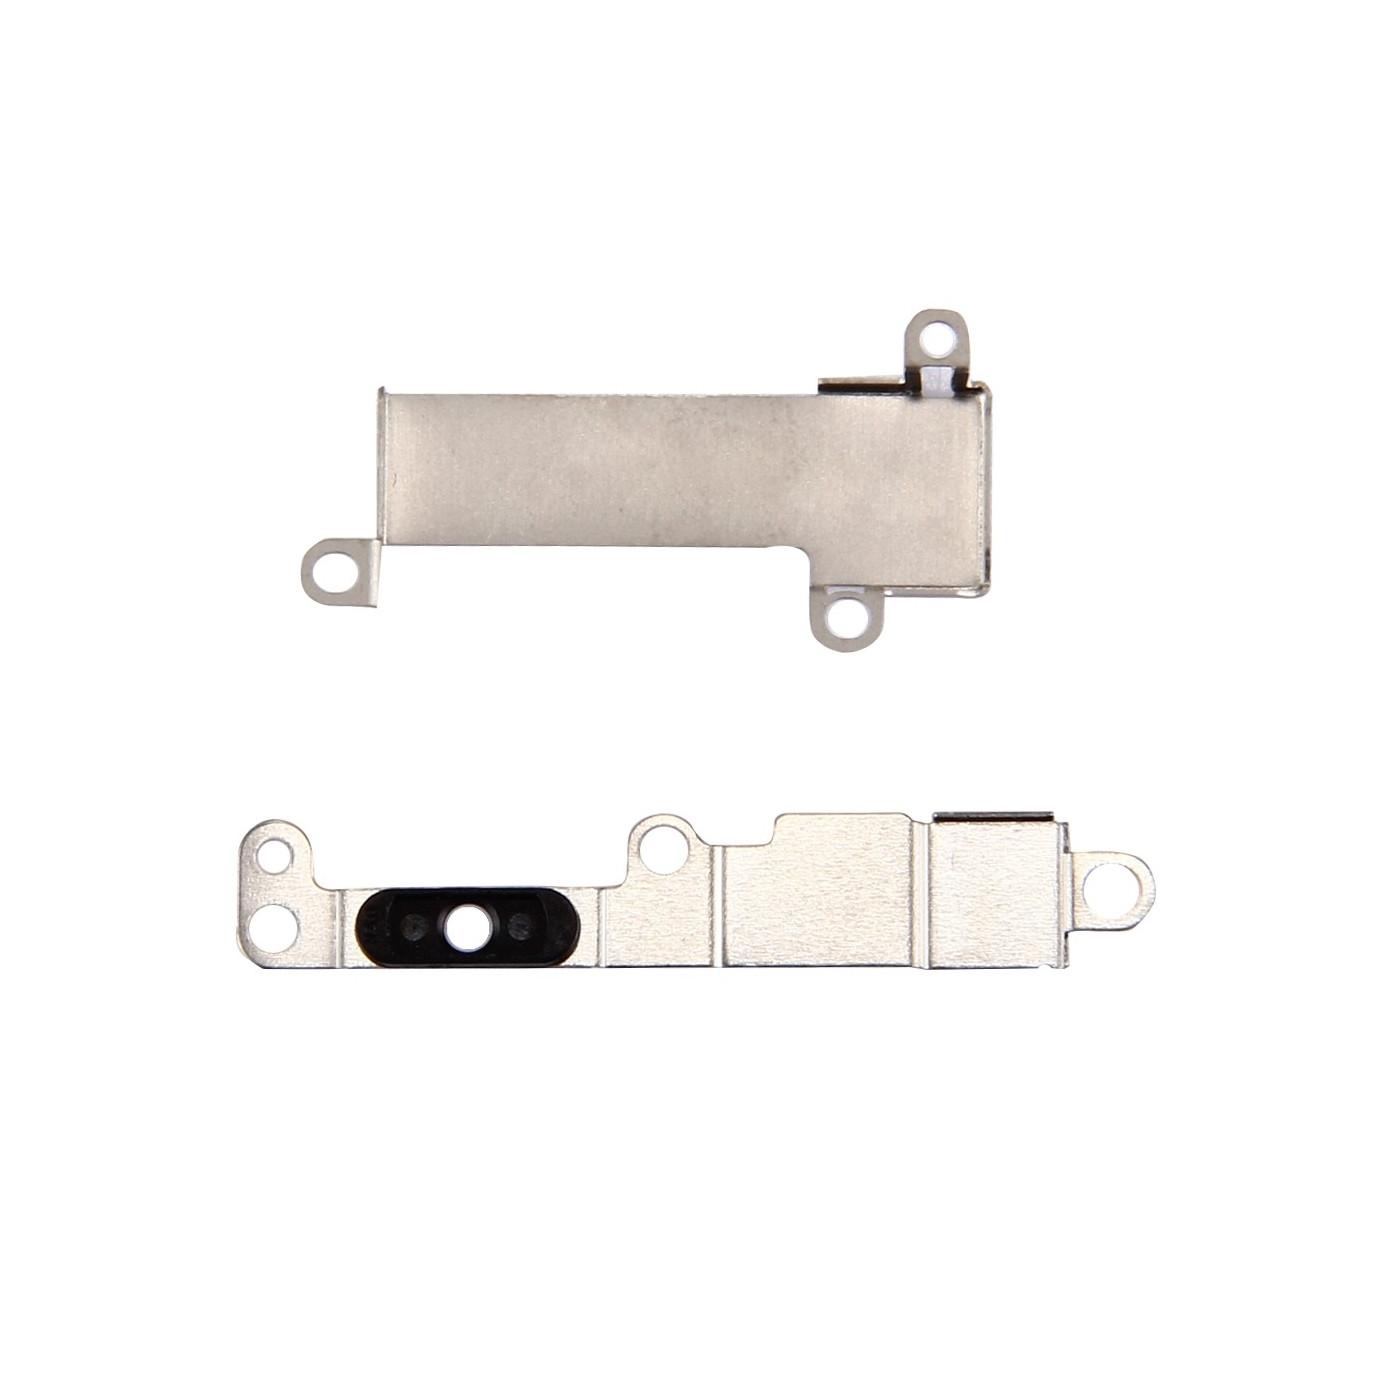 Metallklammerplatte-Hauptknopf iPhone 7 Rückseite Metallbraket Knopf